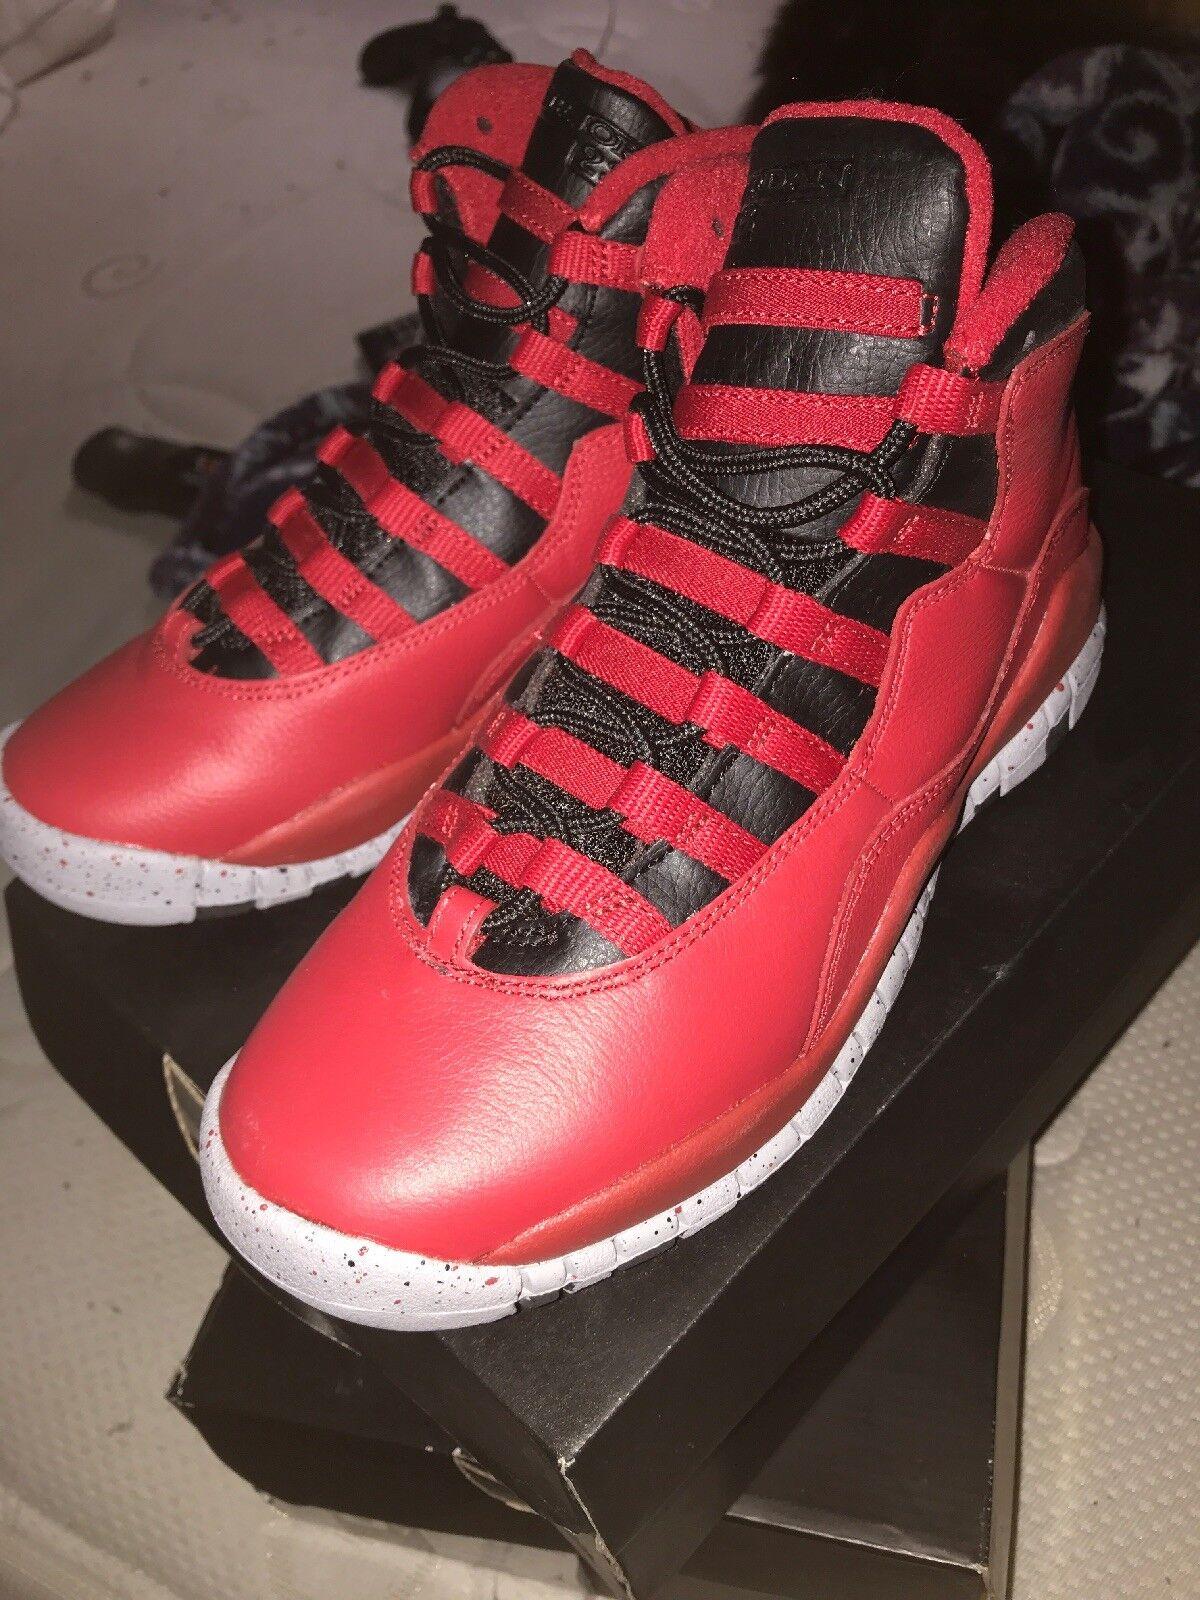 Jordan Retro 10 Bulls Over Broadway Size Size Size 5.5 dbb4e0